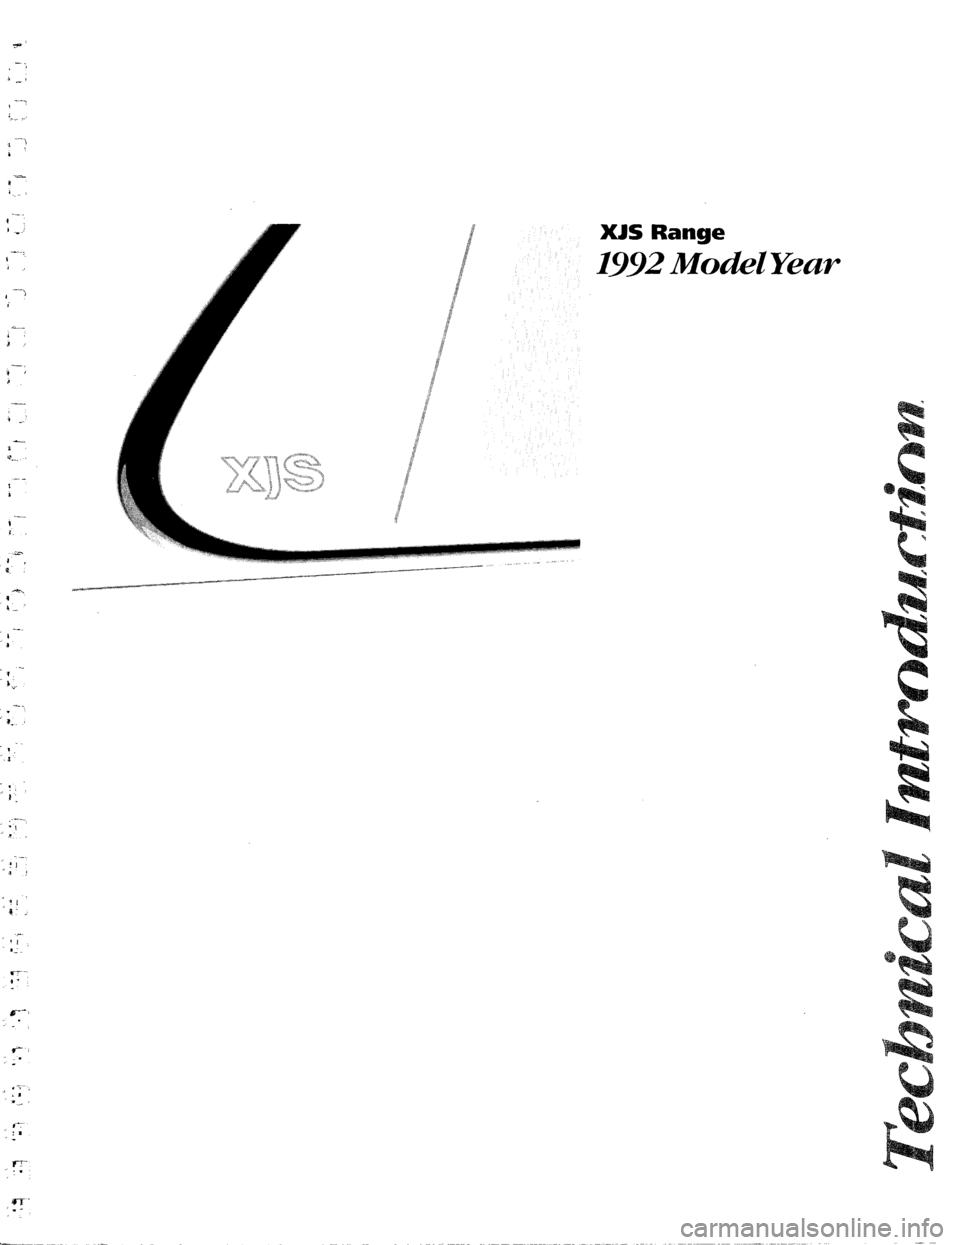 jaguar xjs 1992 1 g technical information manual